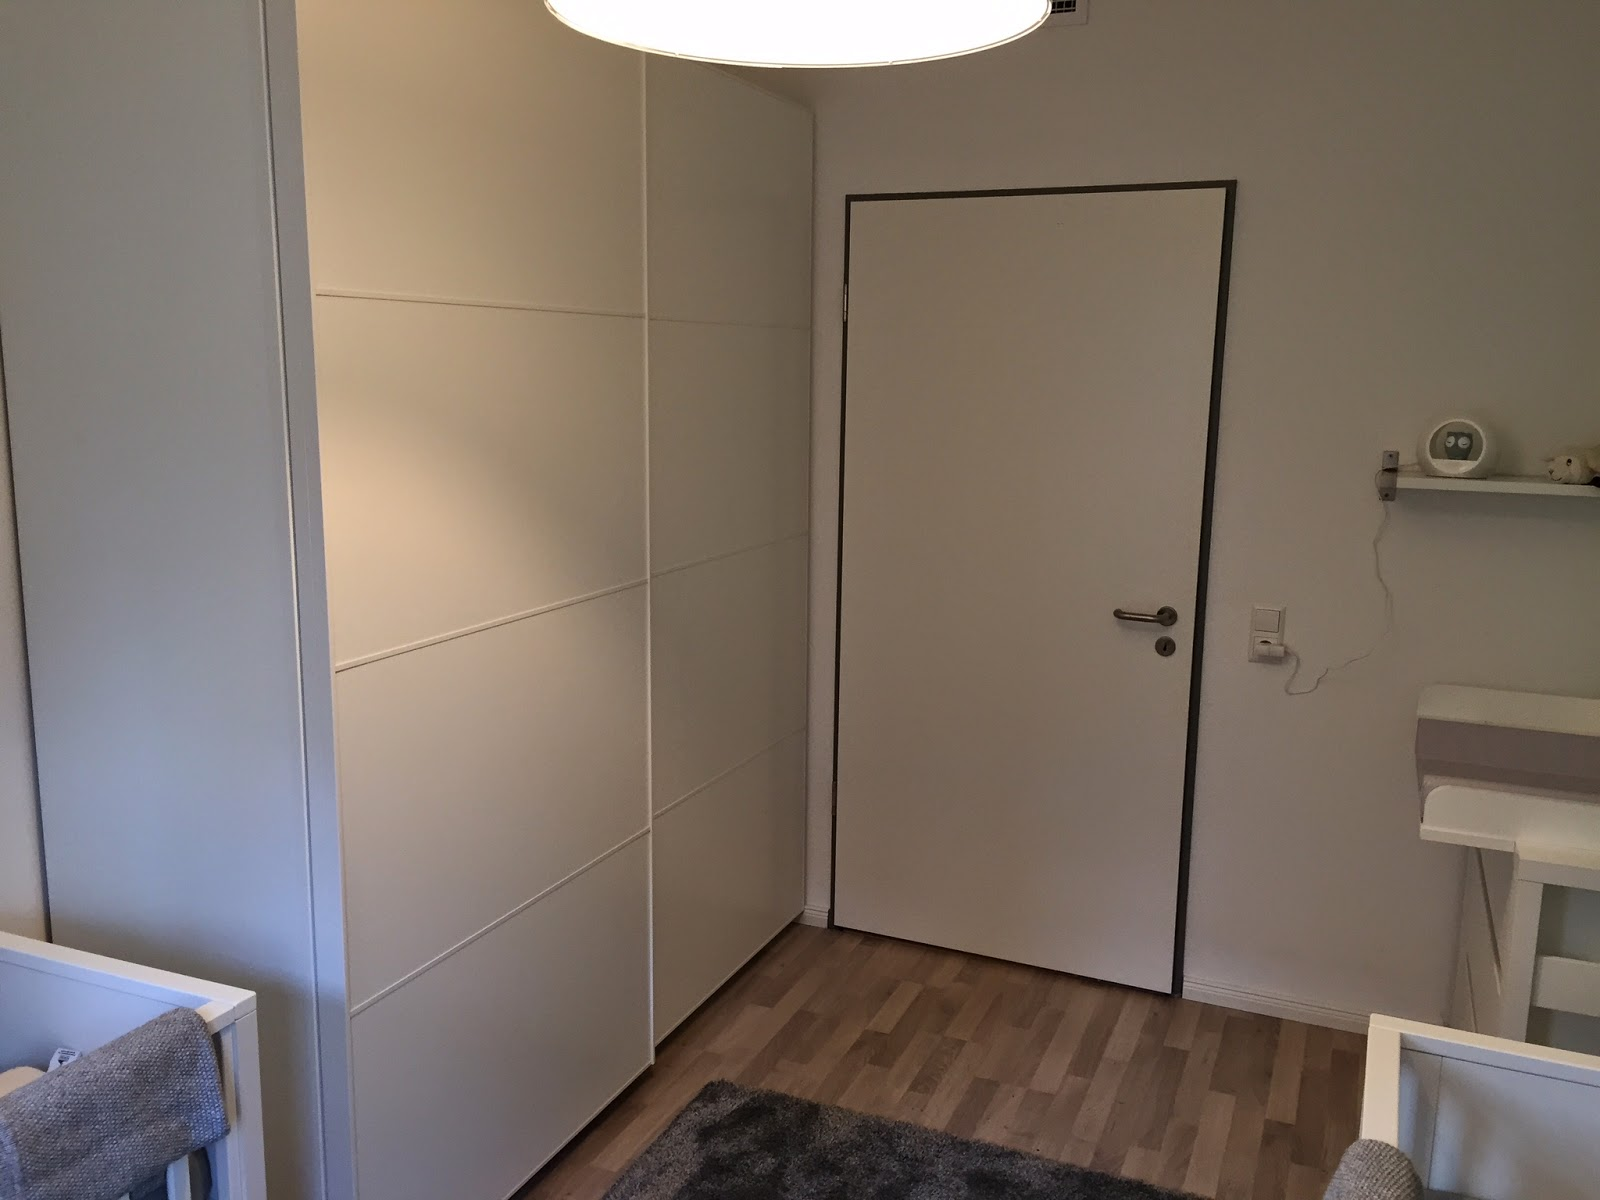 ein blick in das nunmehr langsam fertig werdende zimmer der elbzwillinge elbzwillinge. Black Bedroom Furniture Sets. Home Design Ideas